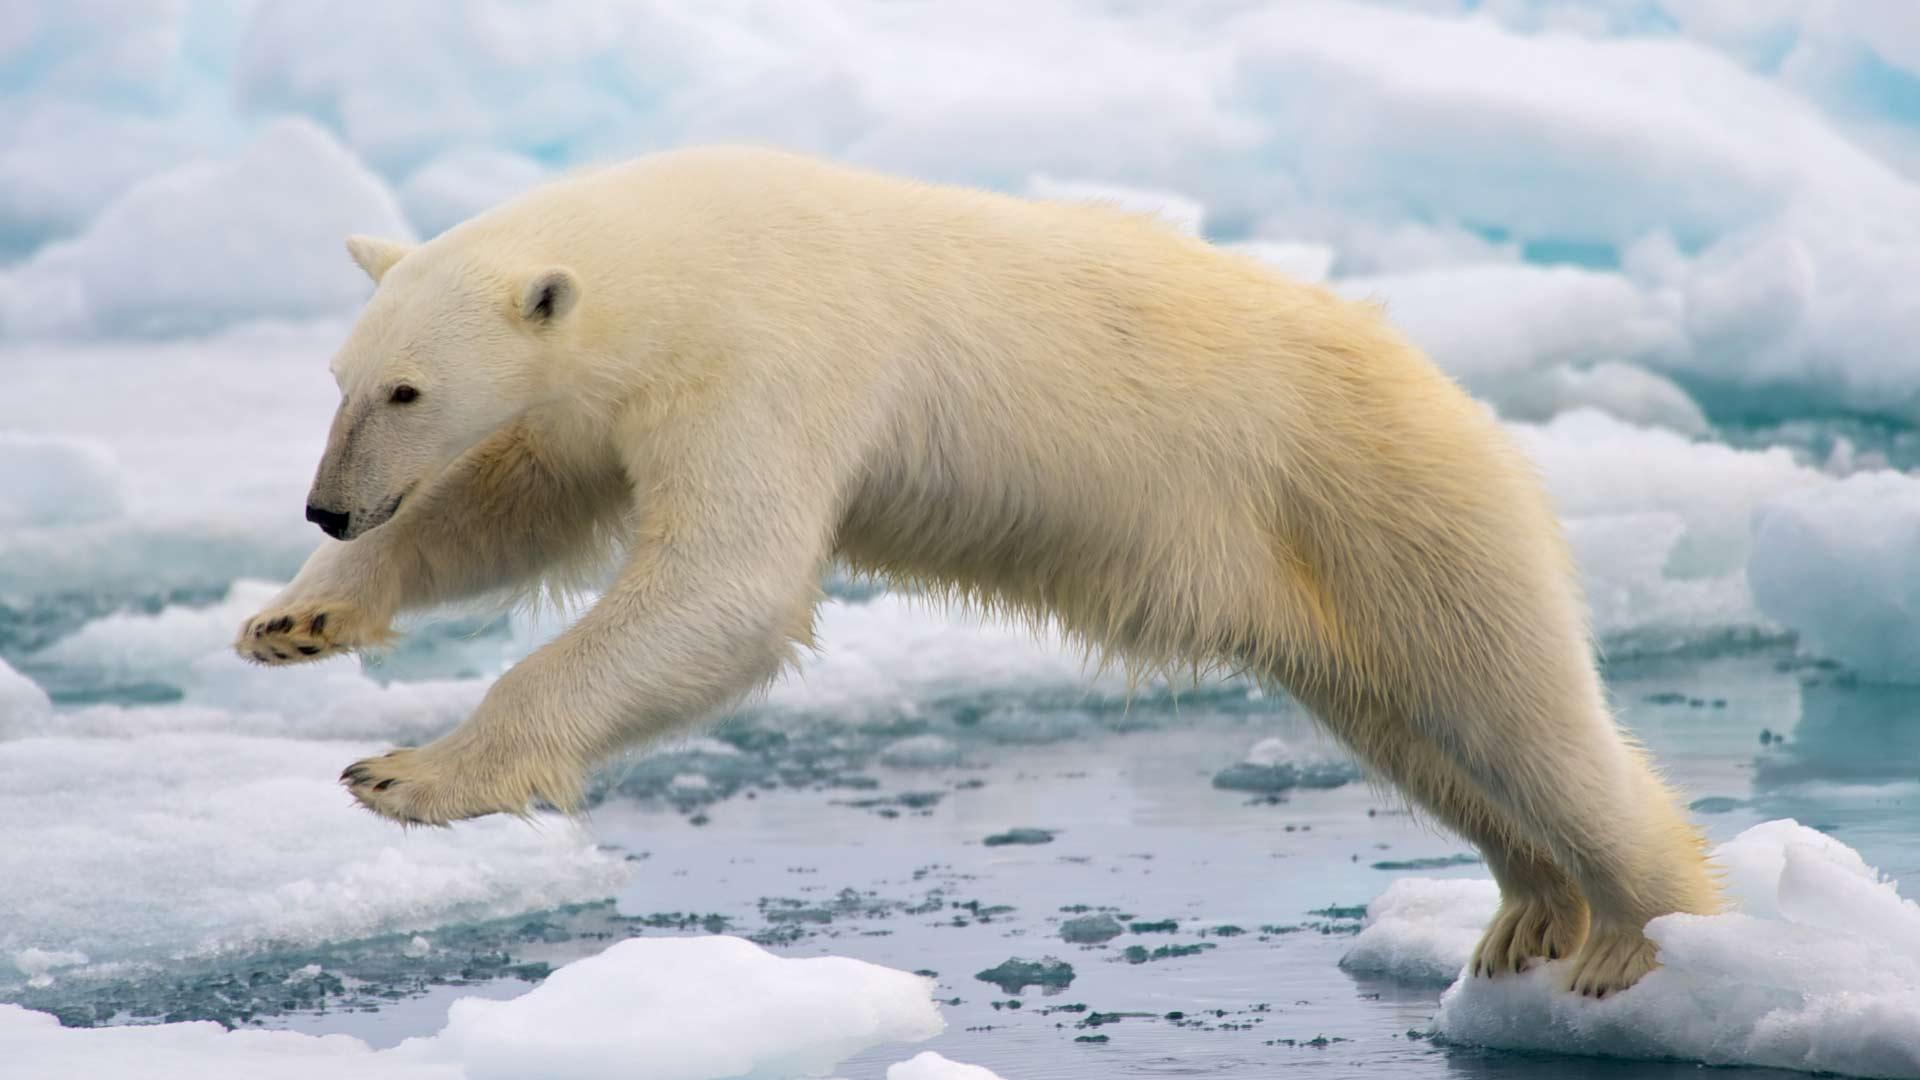 Caro orso polare, perdonaci